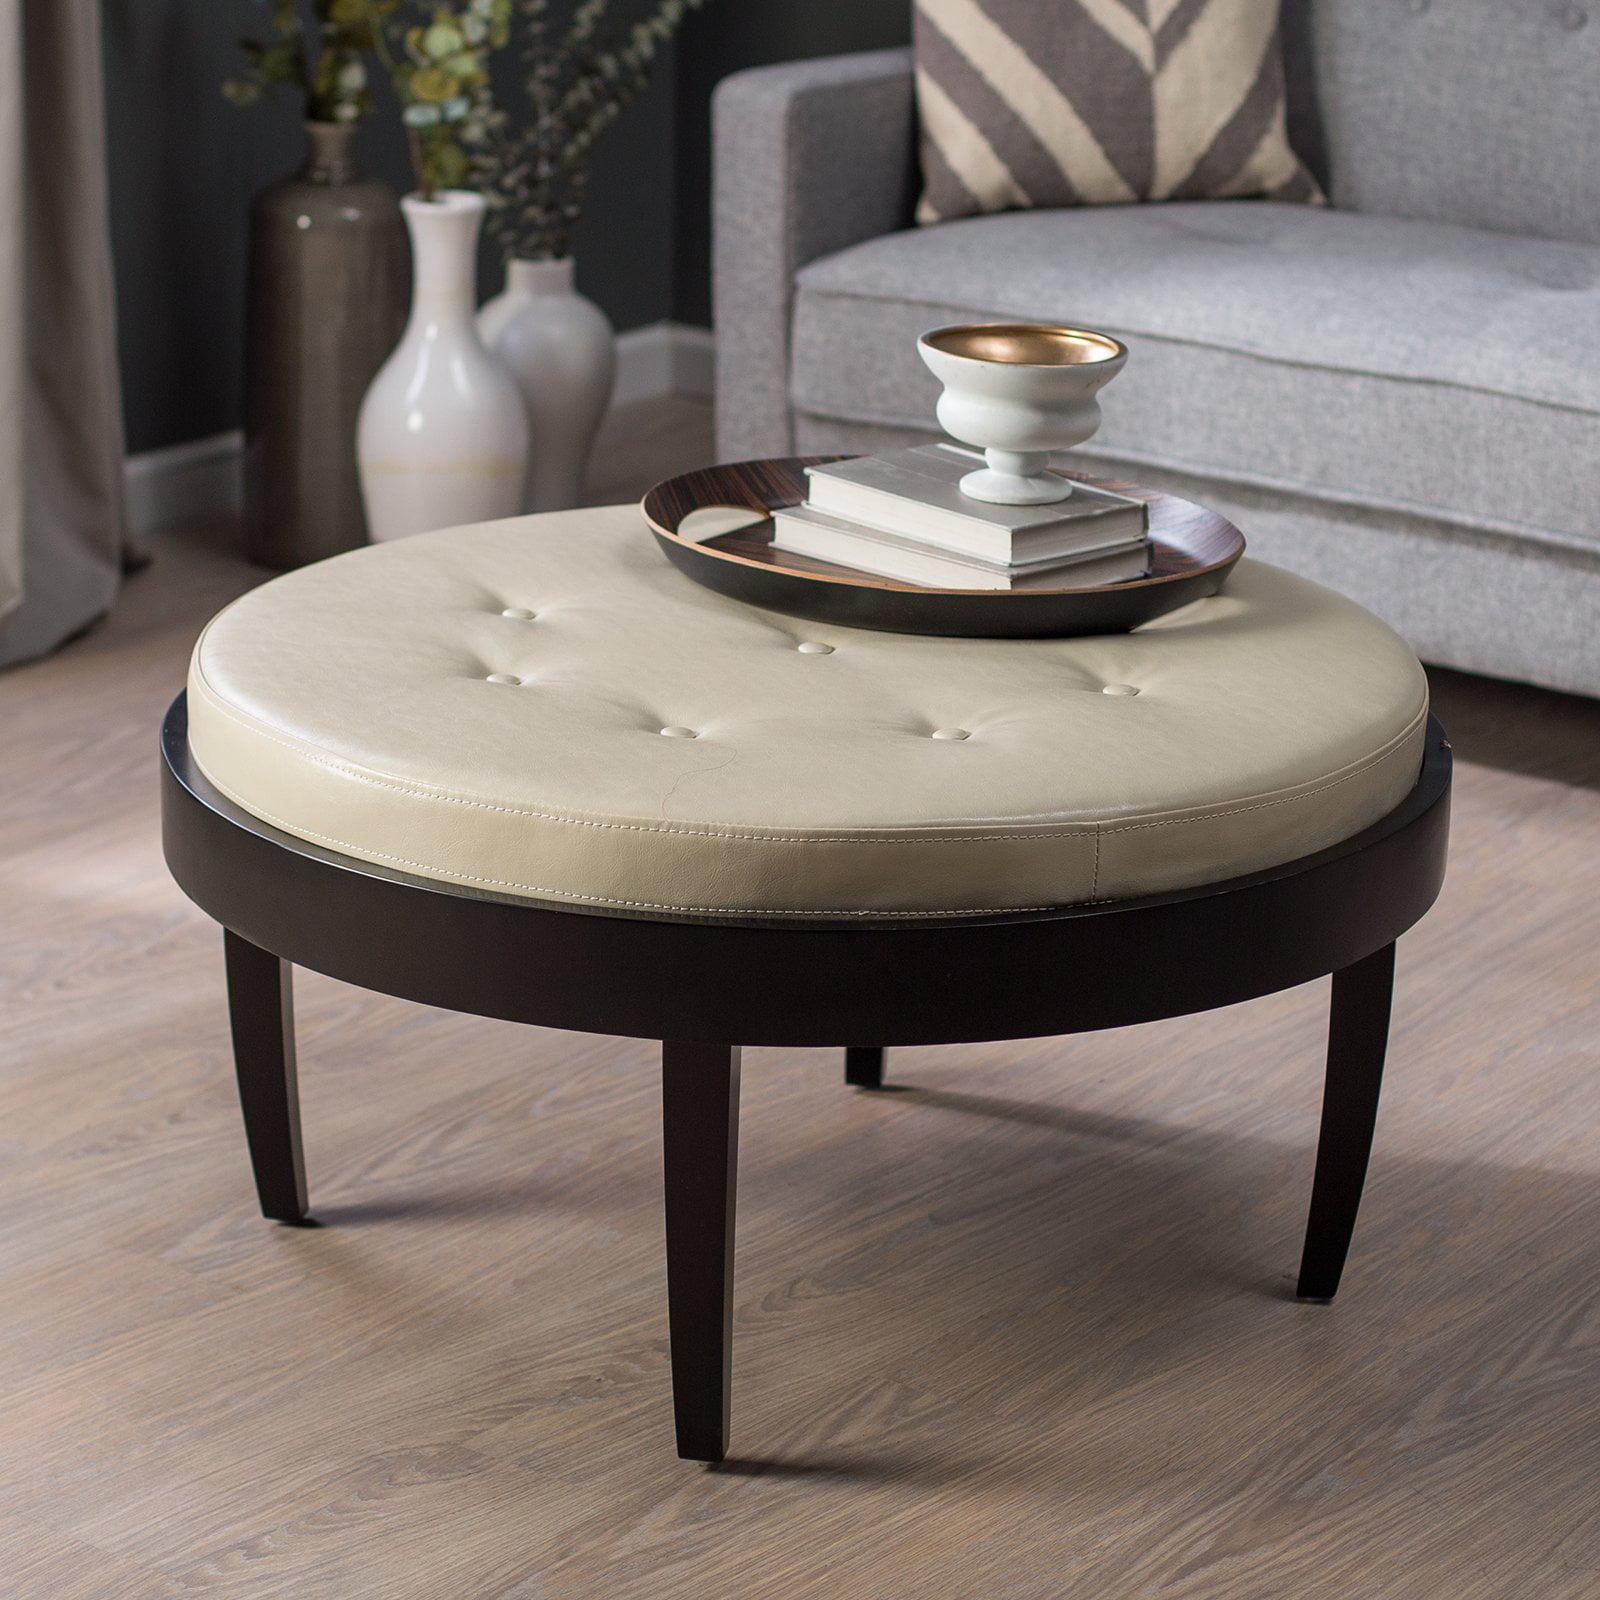 Citation Espresso Coffee Table Ottoman Cream Cushion   Walmart.com